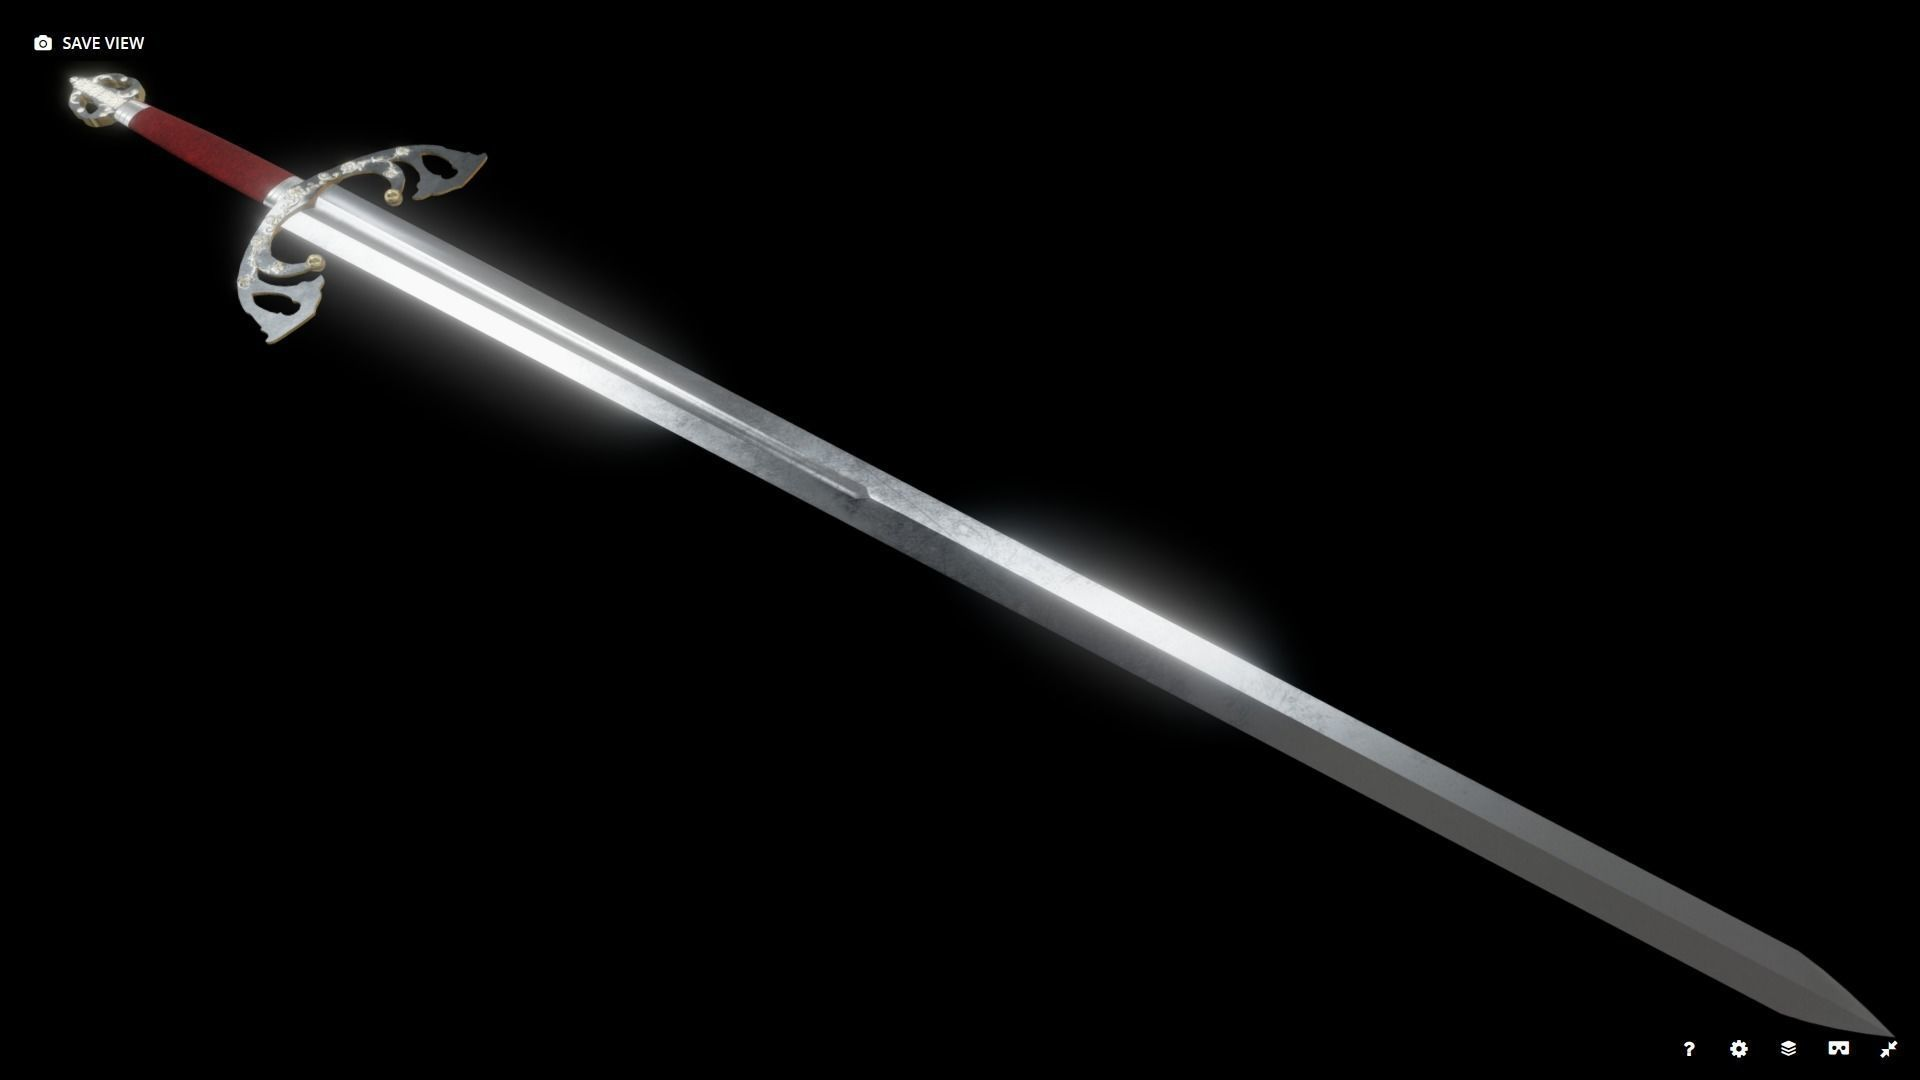 The Tizona Sword of the Cid